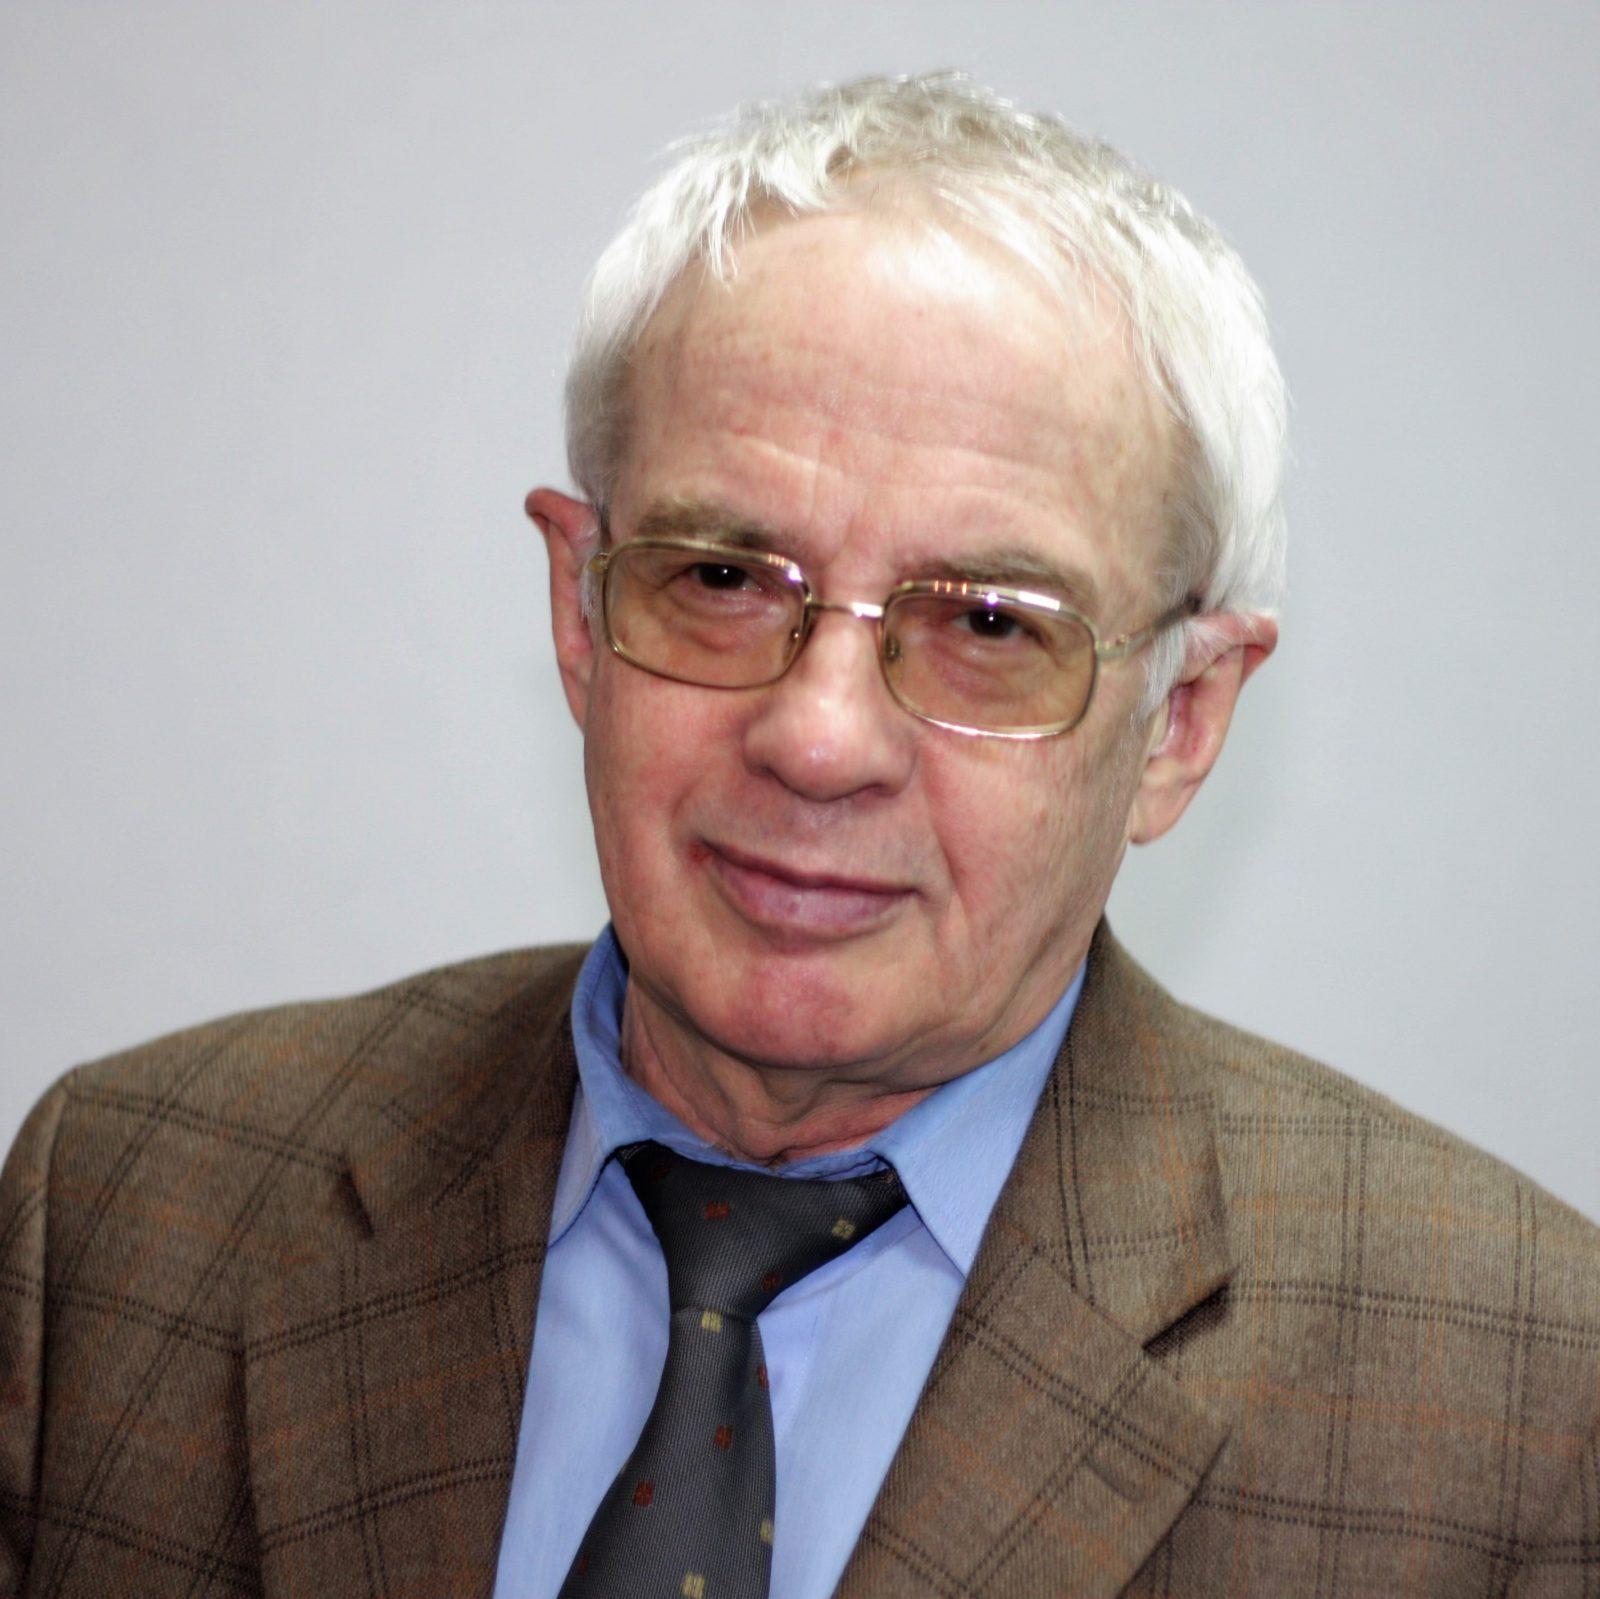 Ленченко Николай Николаевич